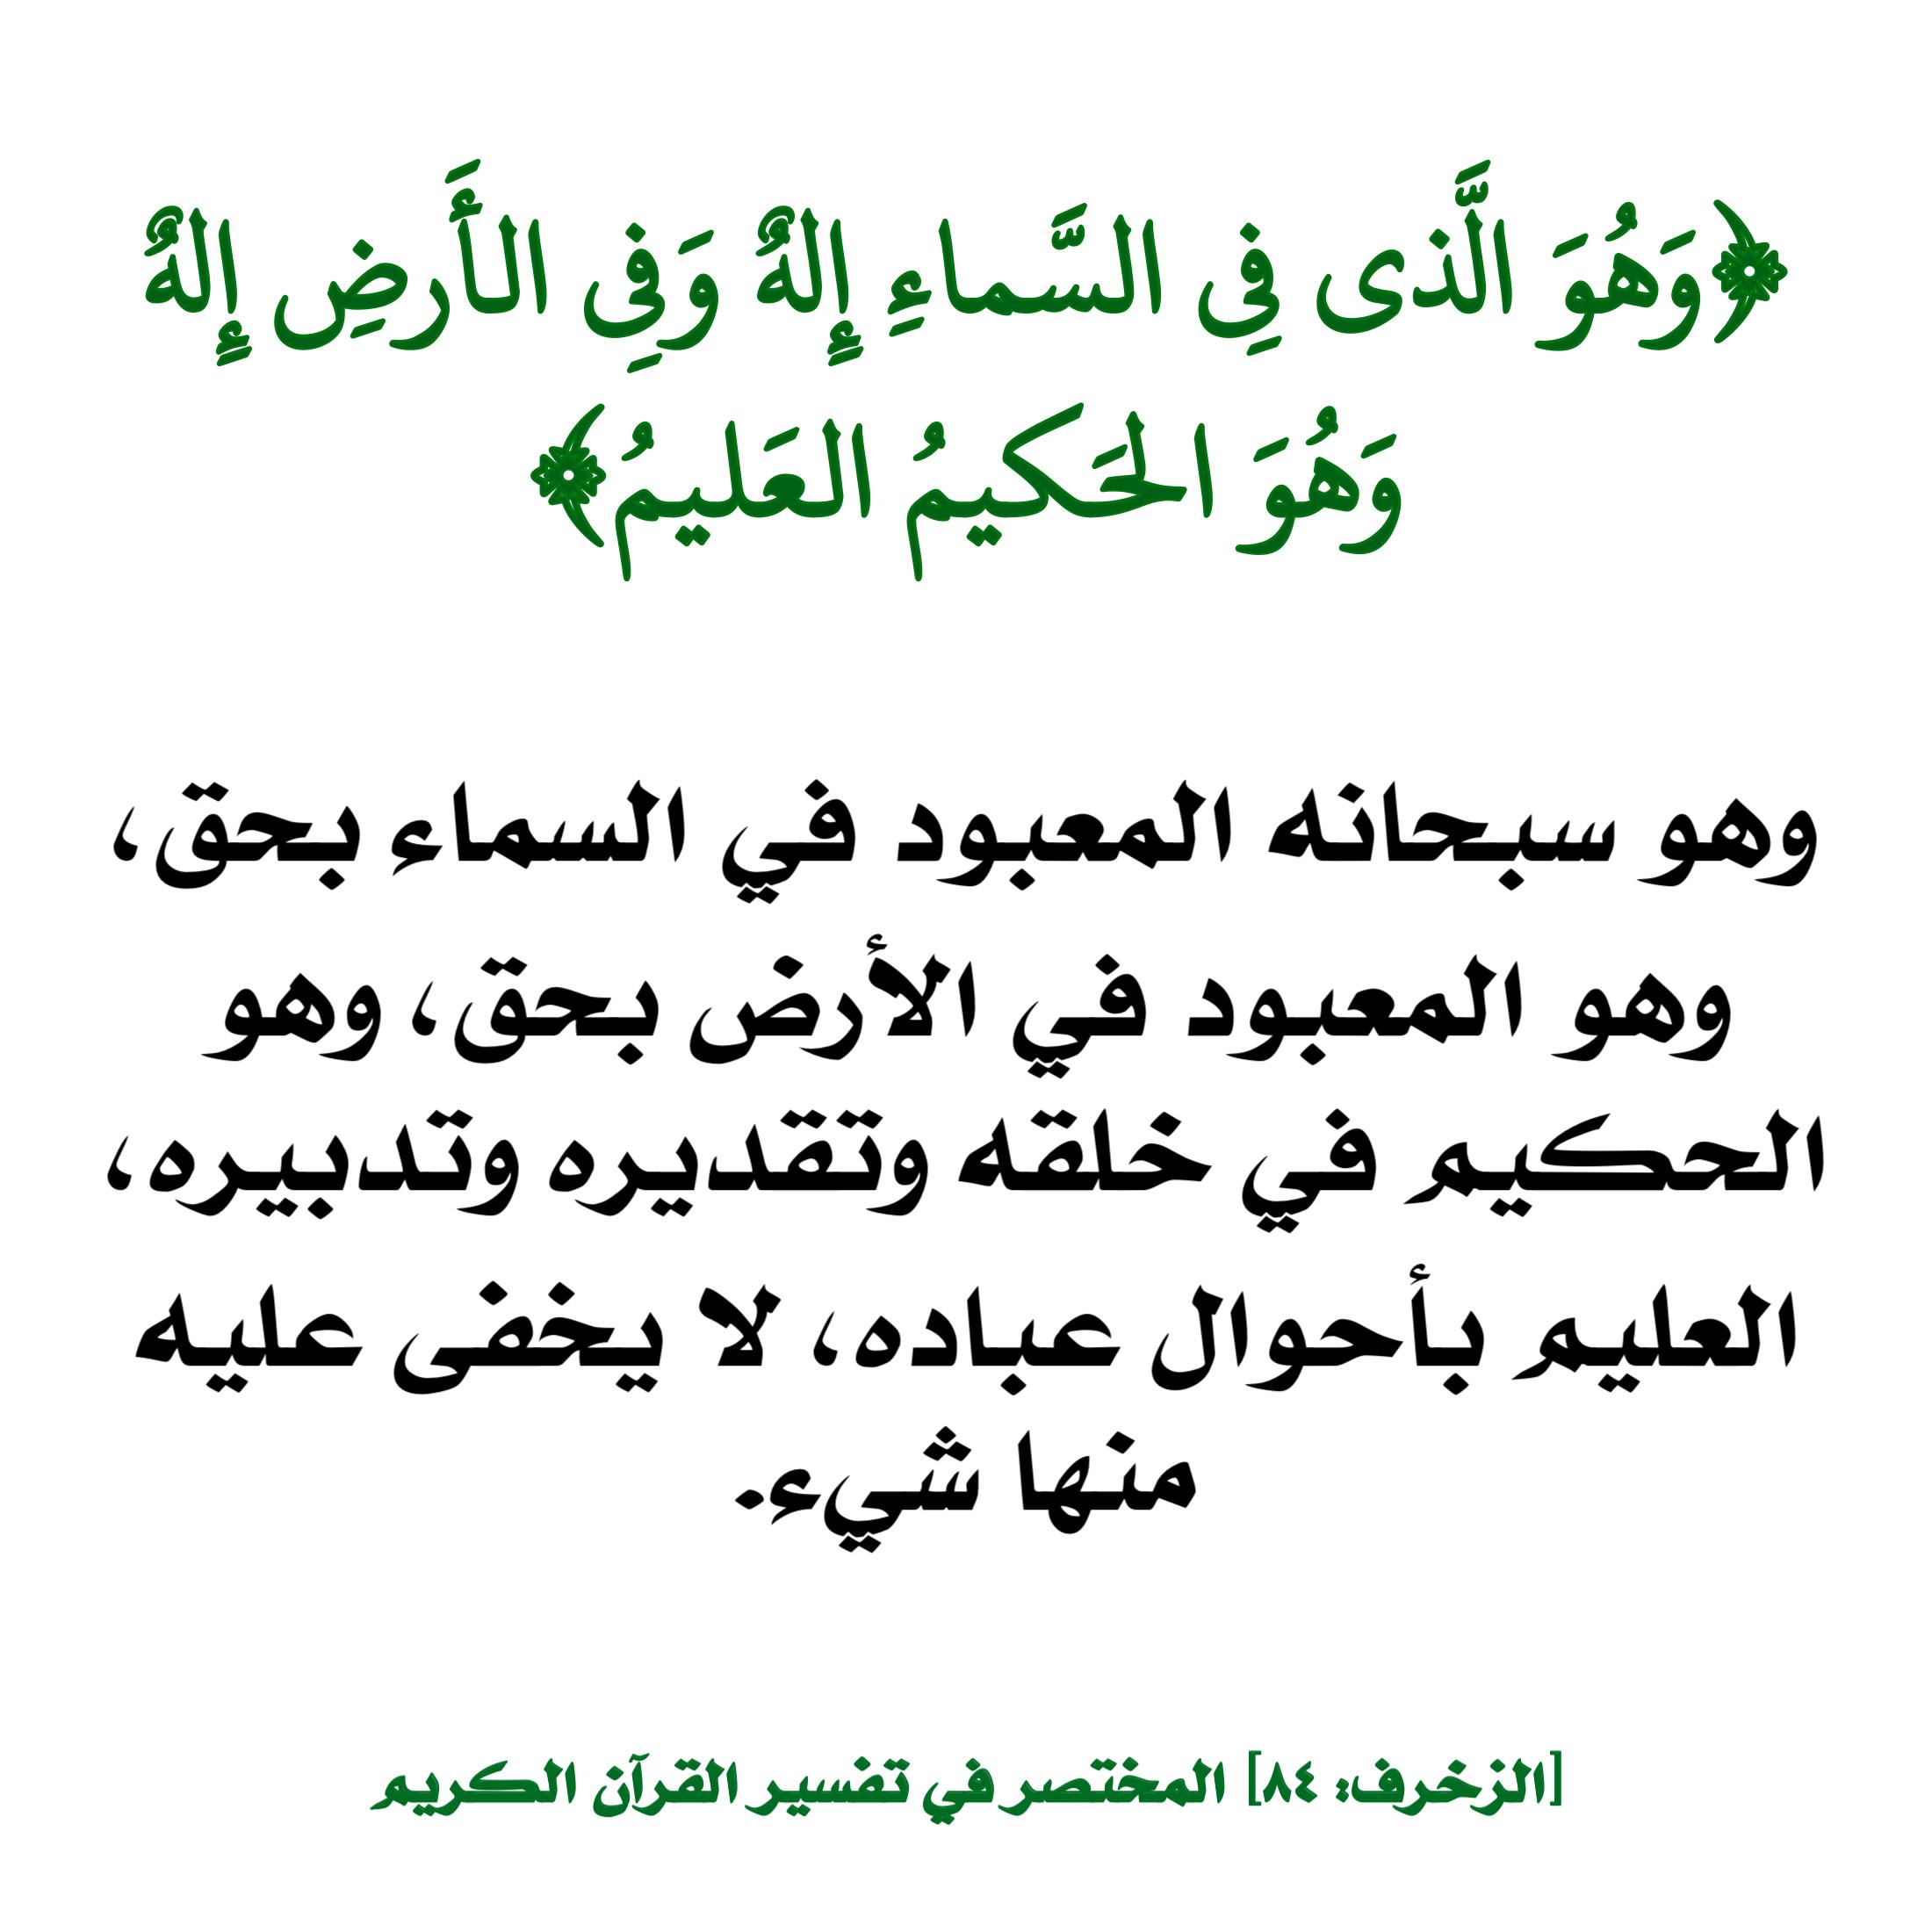 Pin By Julia Dinalru On آية وتفسير Holy Quran Quran Math